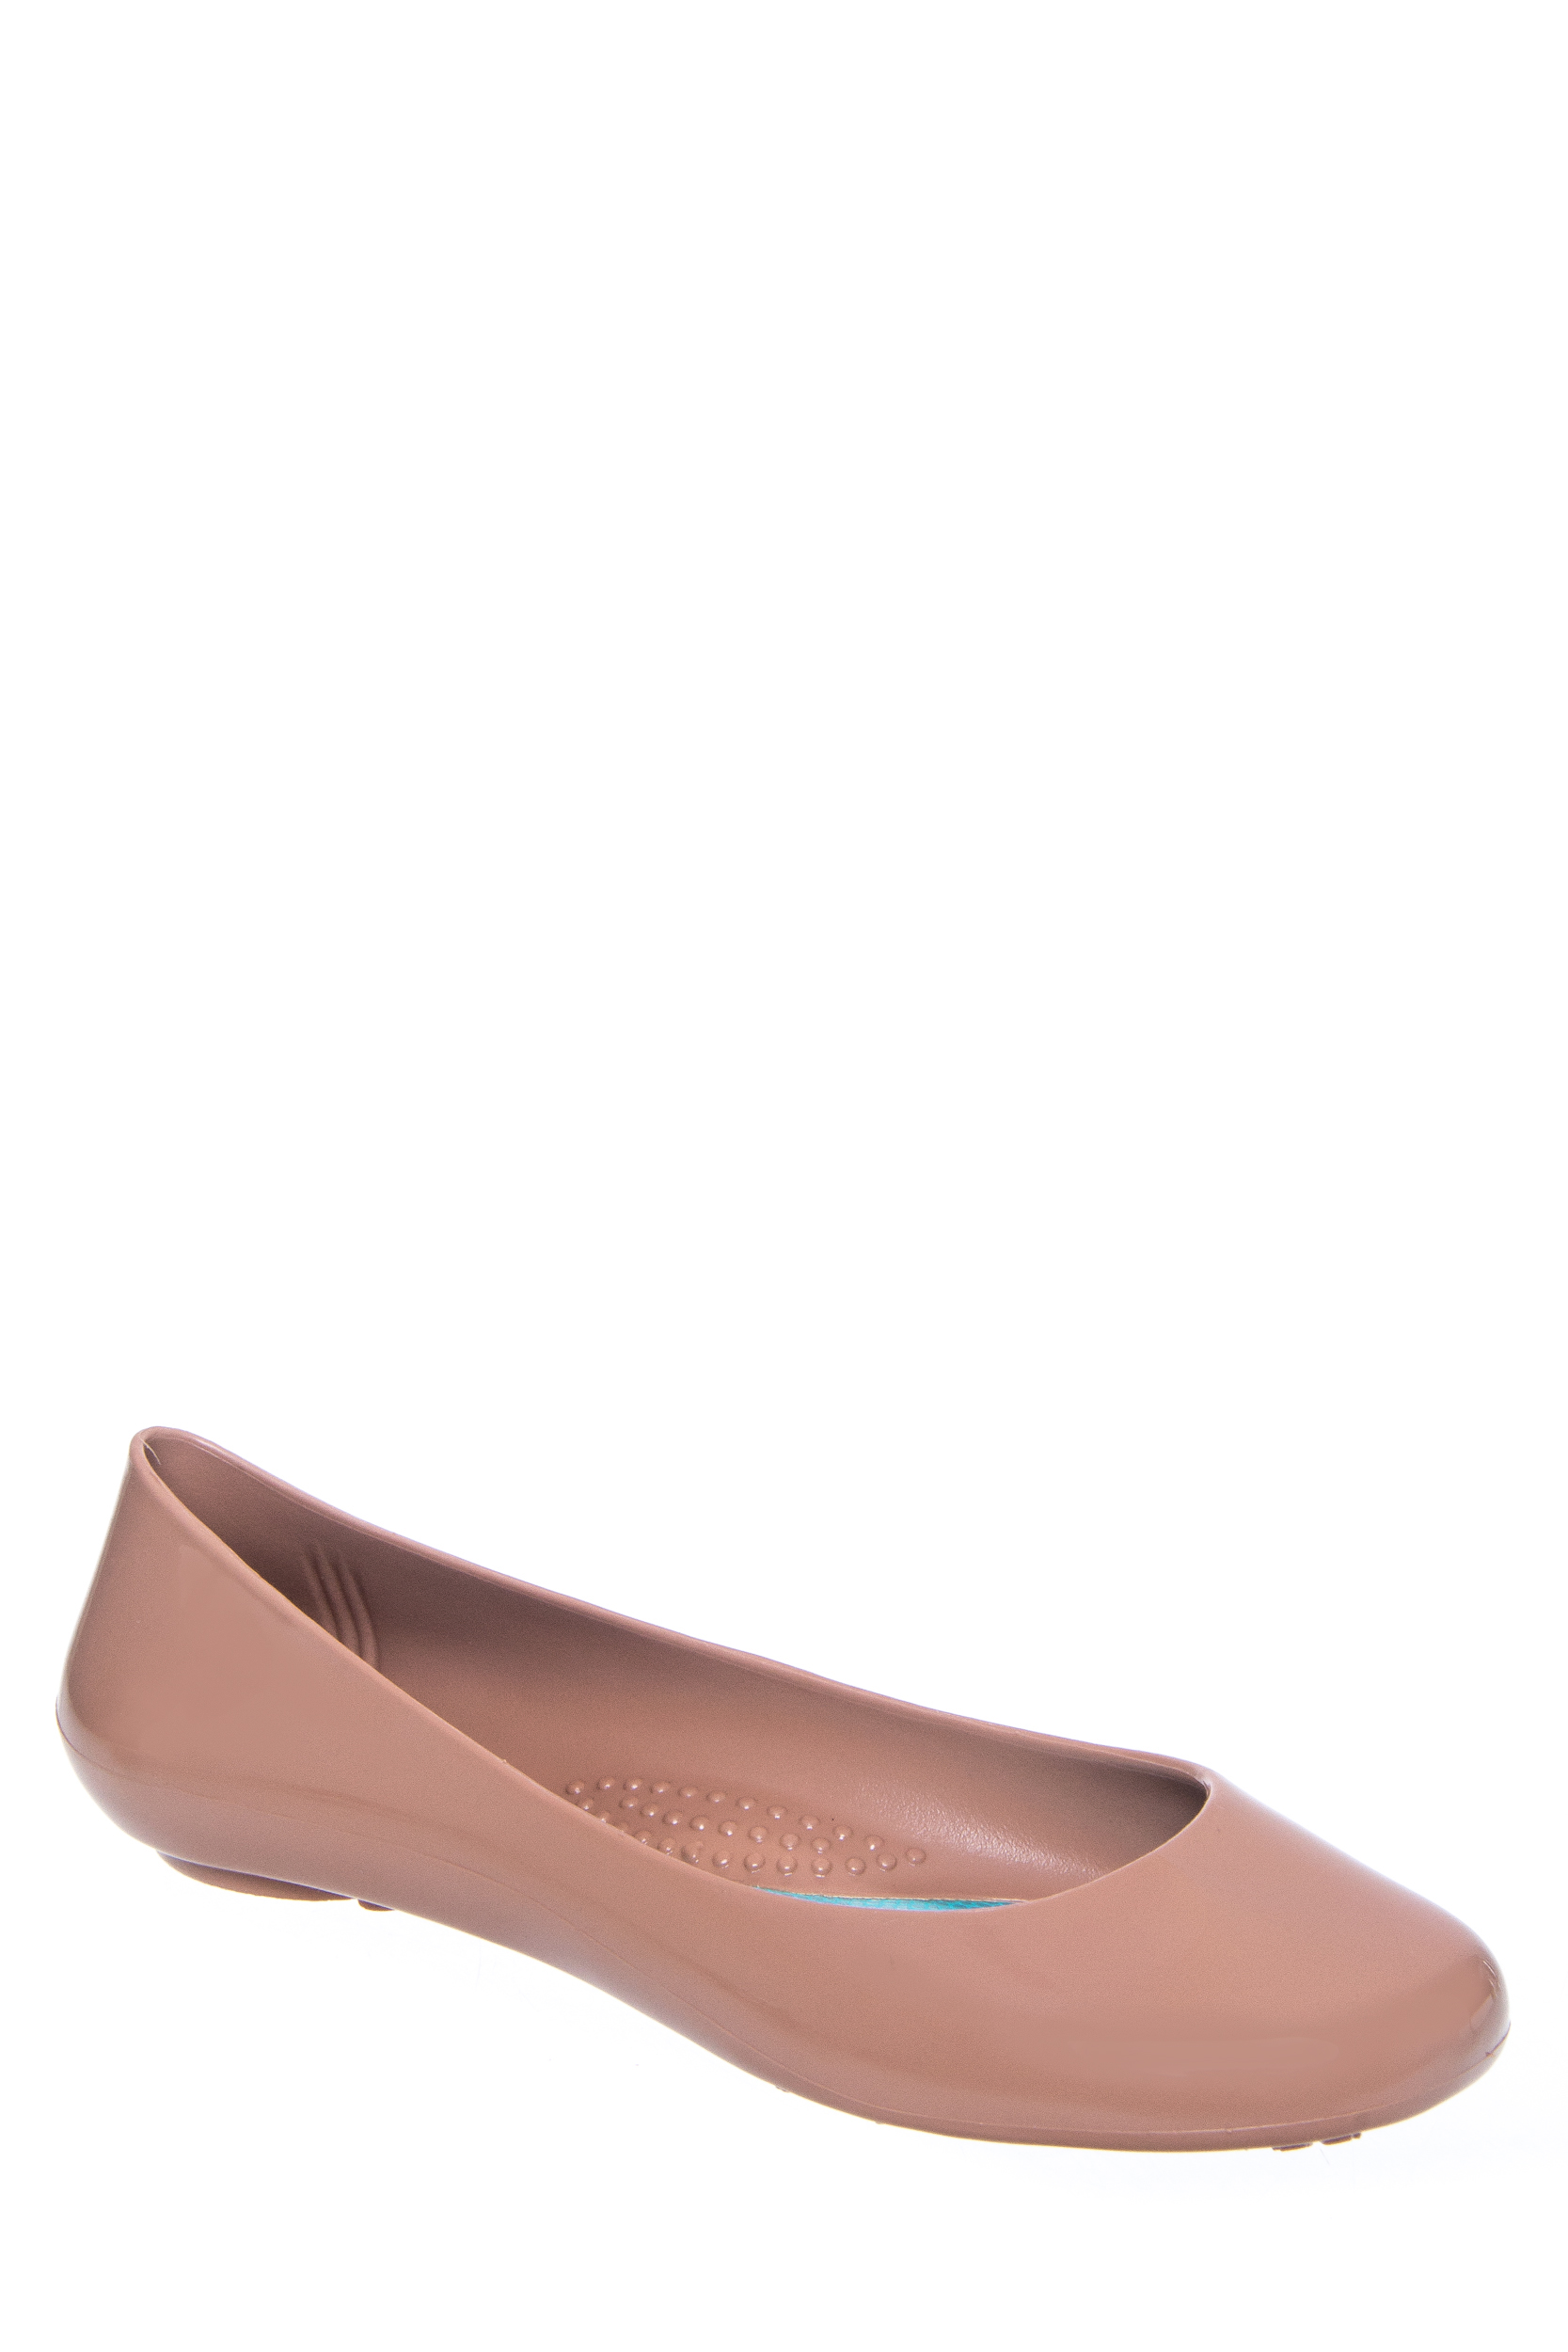 e19deaa58fc6e4 886782011898. OKA B. Taylor Round Toe Jelly Flat Shoe - Blush Size 9